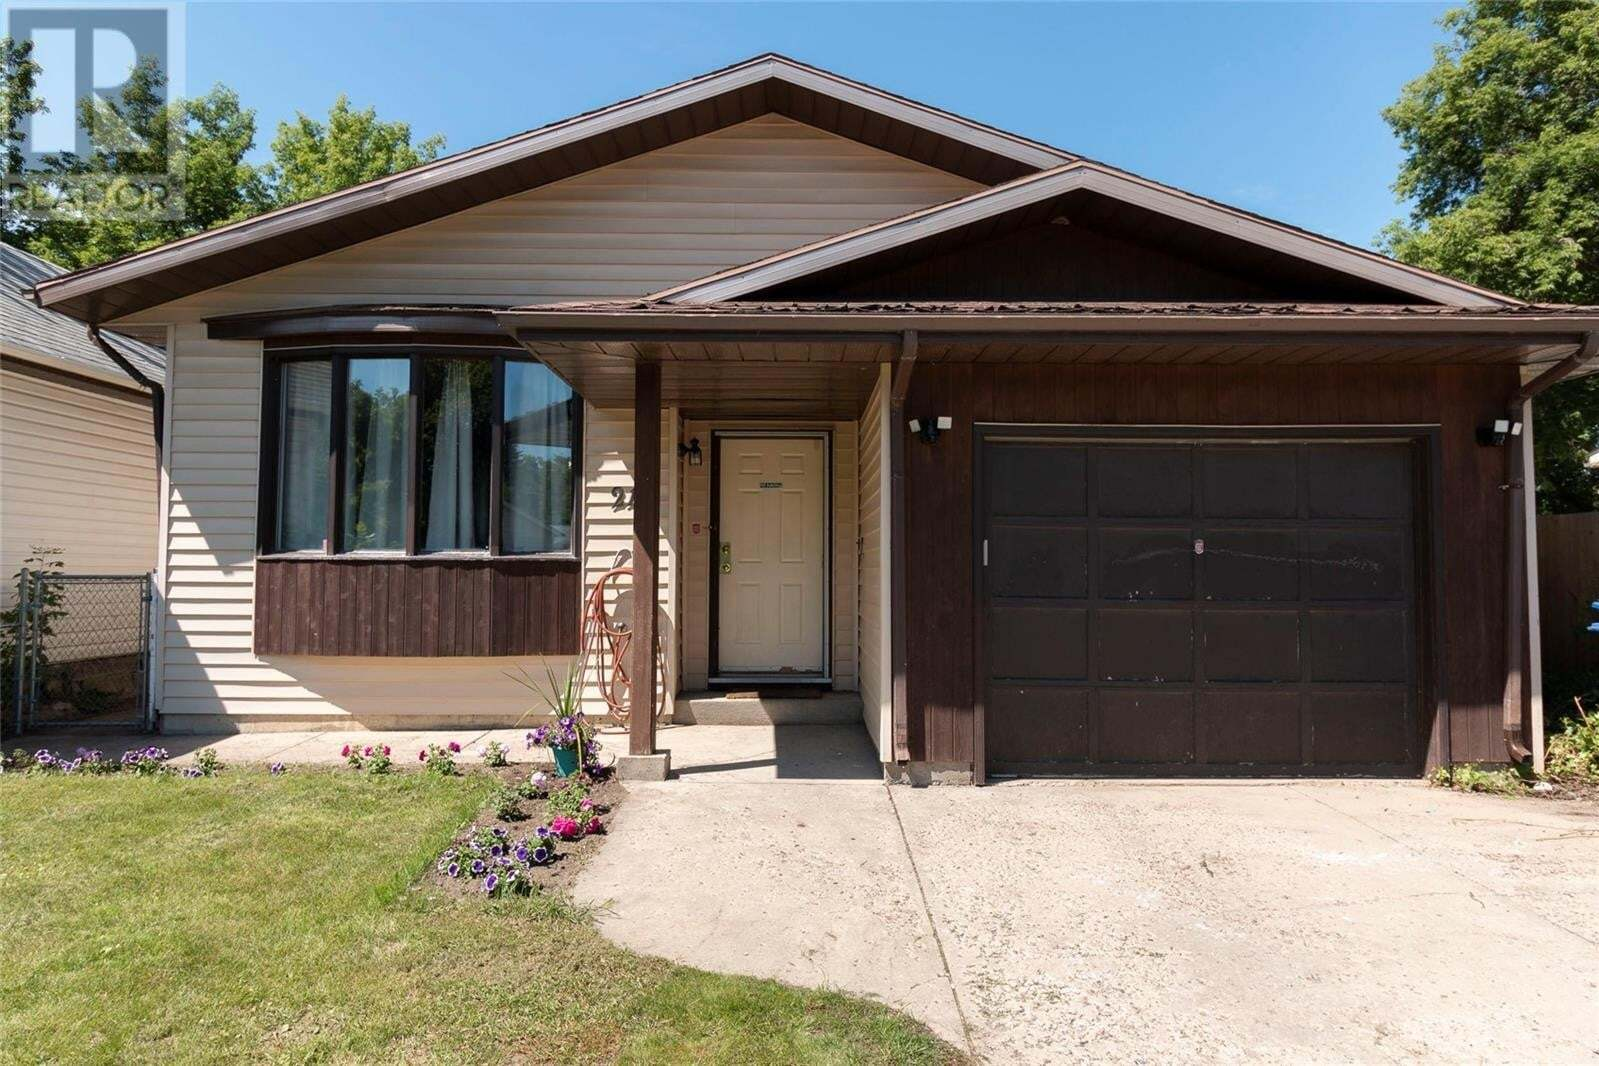 House for sale at 211 L Ave N Saskatoon Saskatchewan - MLS: SK817524